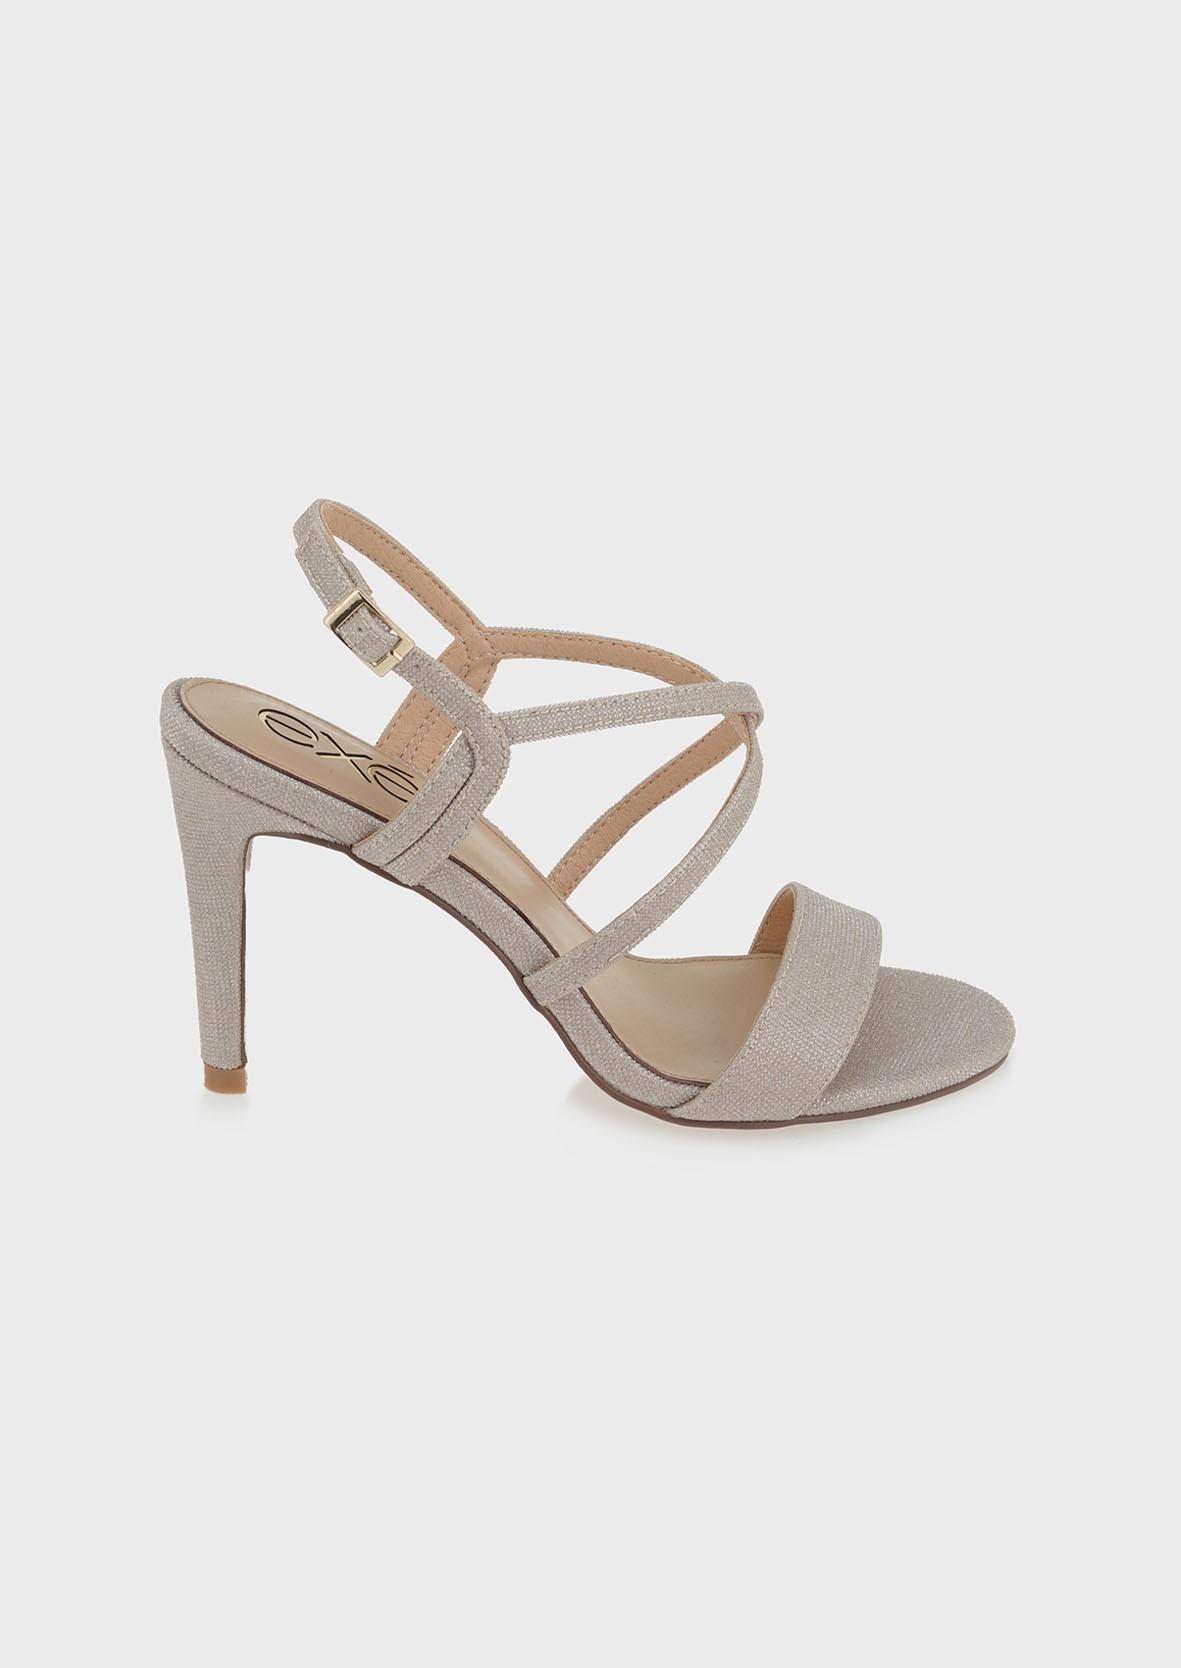 EXE Shoes Πέδιλα Γυναικεία 093-REBECA-393 Πλατίνα GLITTER M4700093579C